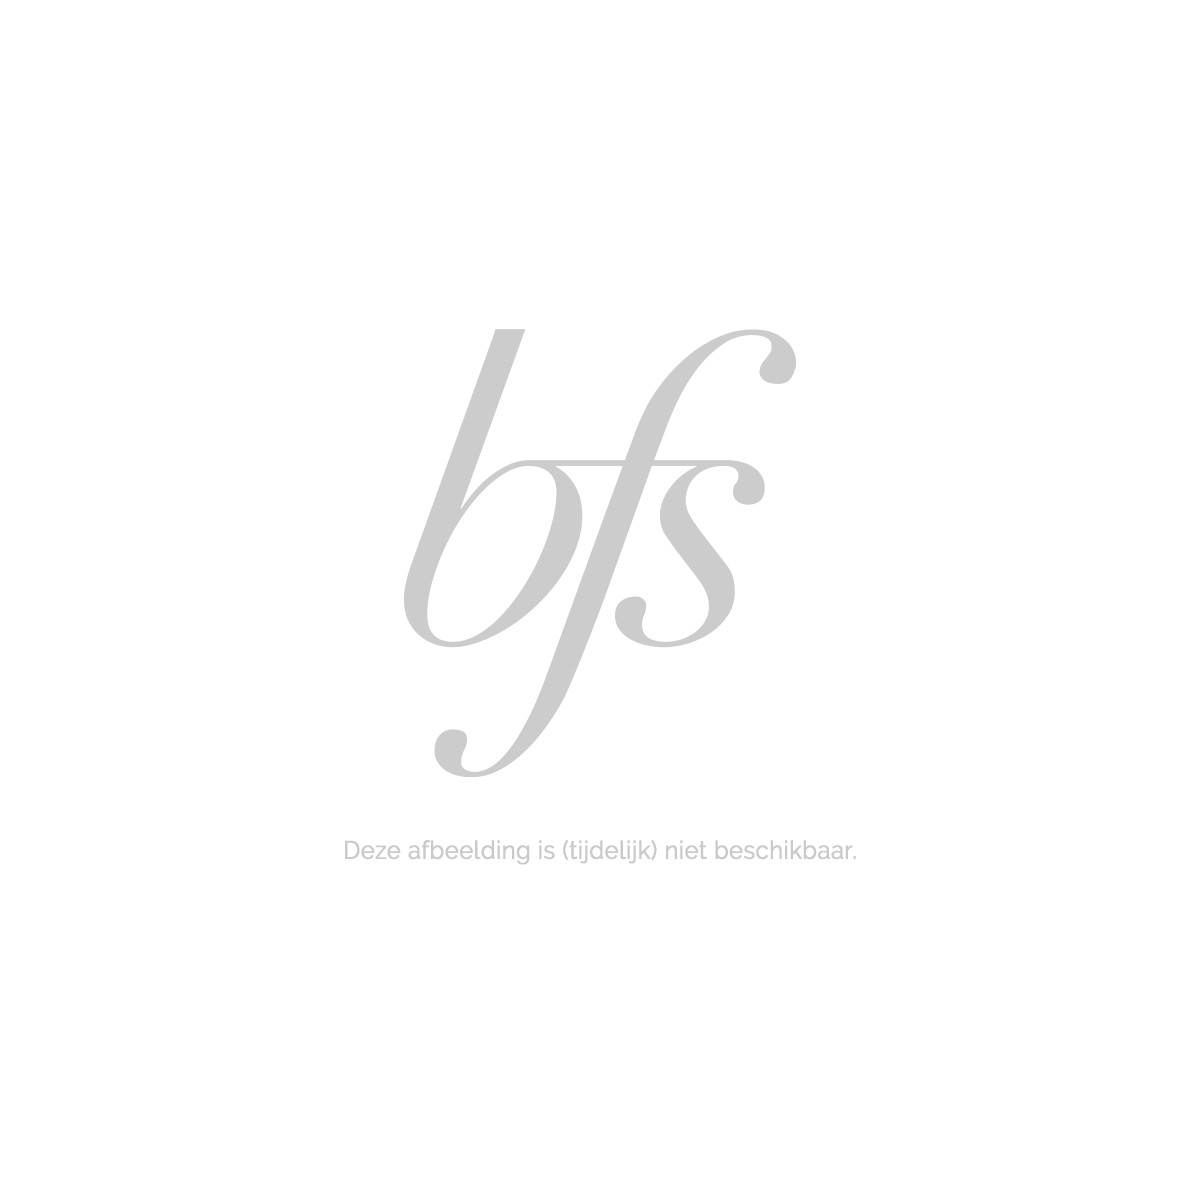 Afbeelding van Dermalogica Breakout Clearing All Over Toner Reiniging Acne & Puistjes Beauty